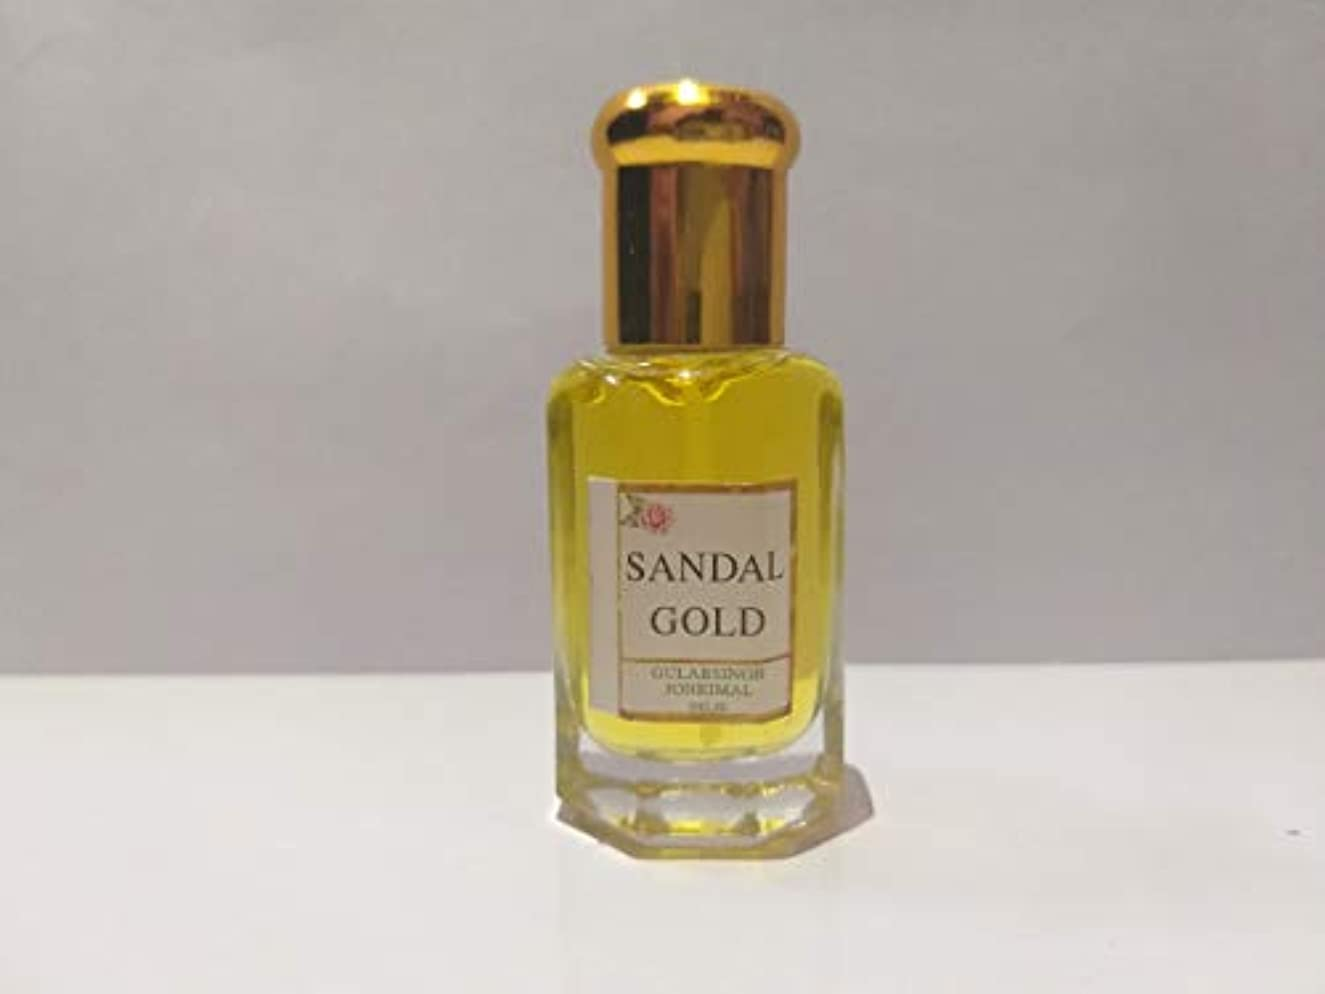 Sandal/白檀 / Chandan Attar/Ittar concentrated Perfume Oil - 10ml Beautiful Aroma